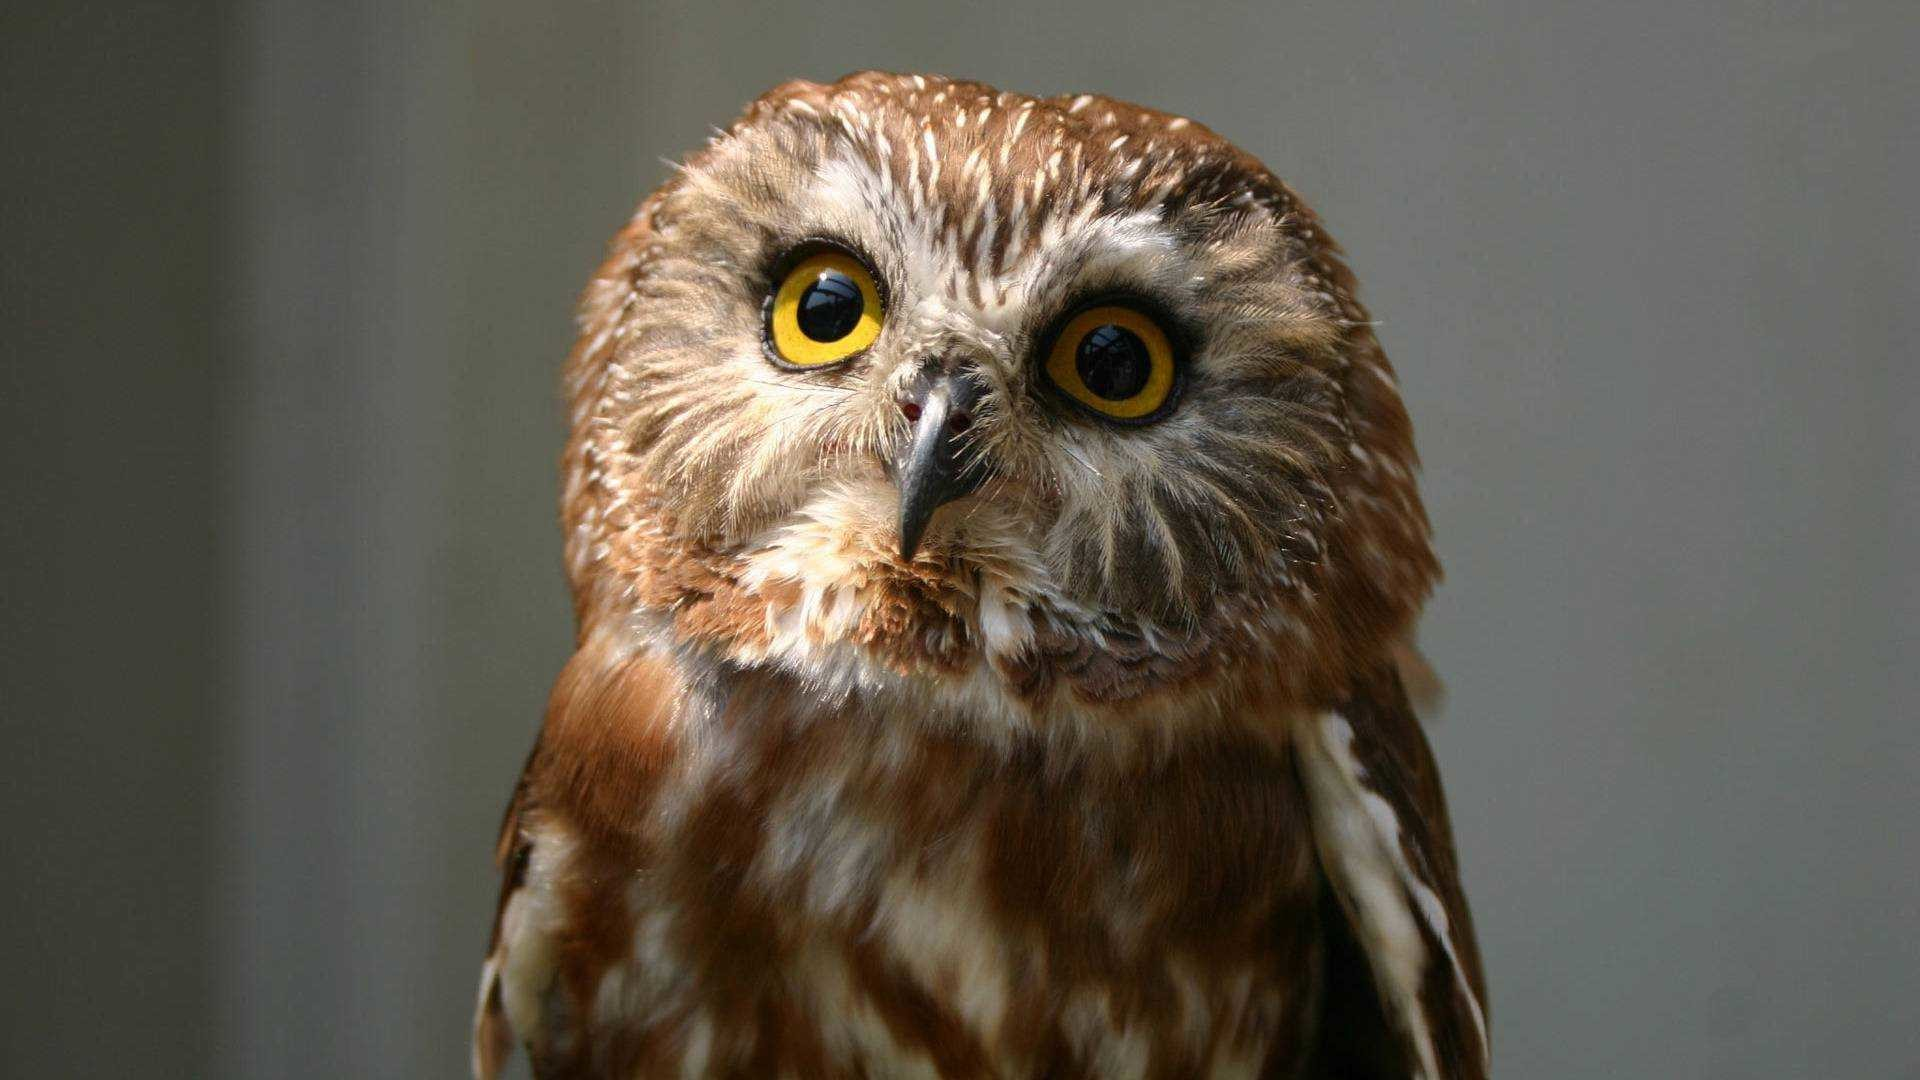 Res: 1920x1080, Wallpaper Of Cute Owl Hd Pictures Full Pics Desktop Images